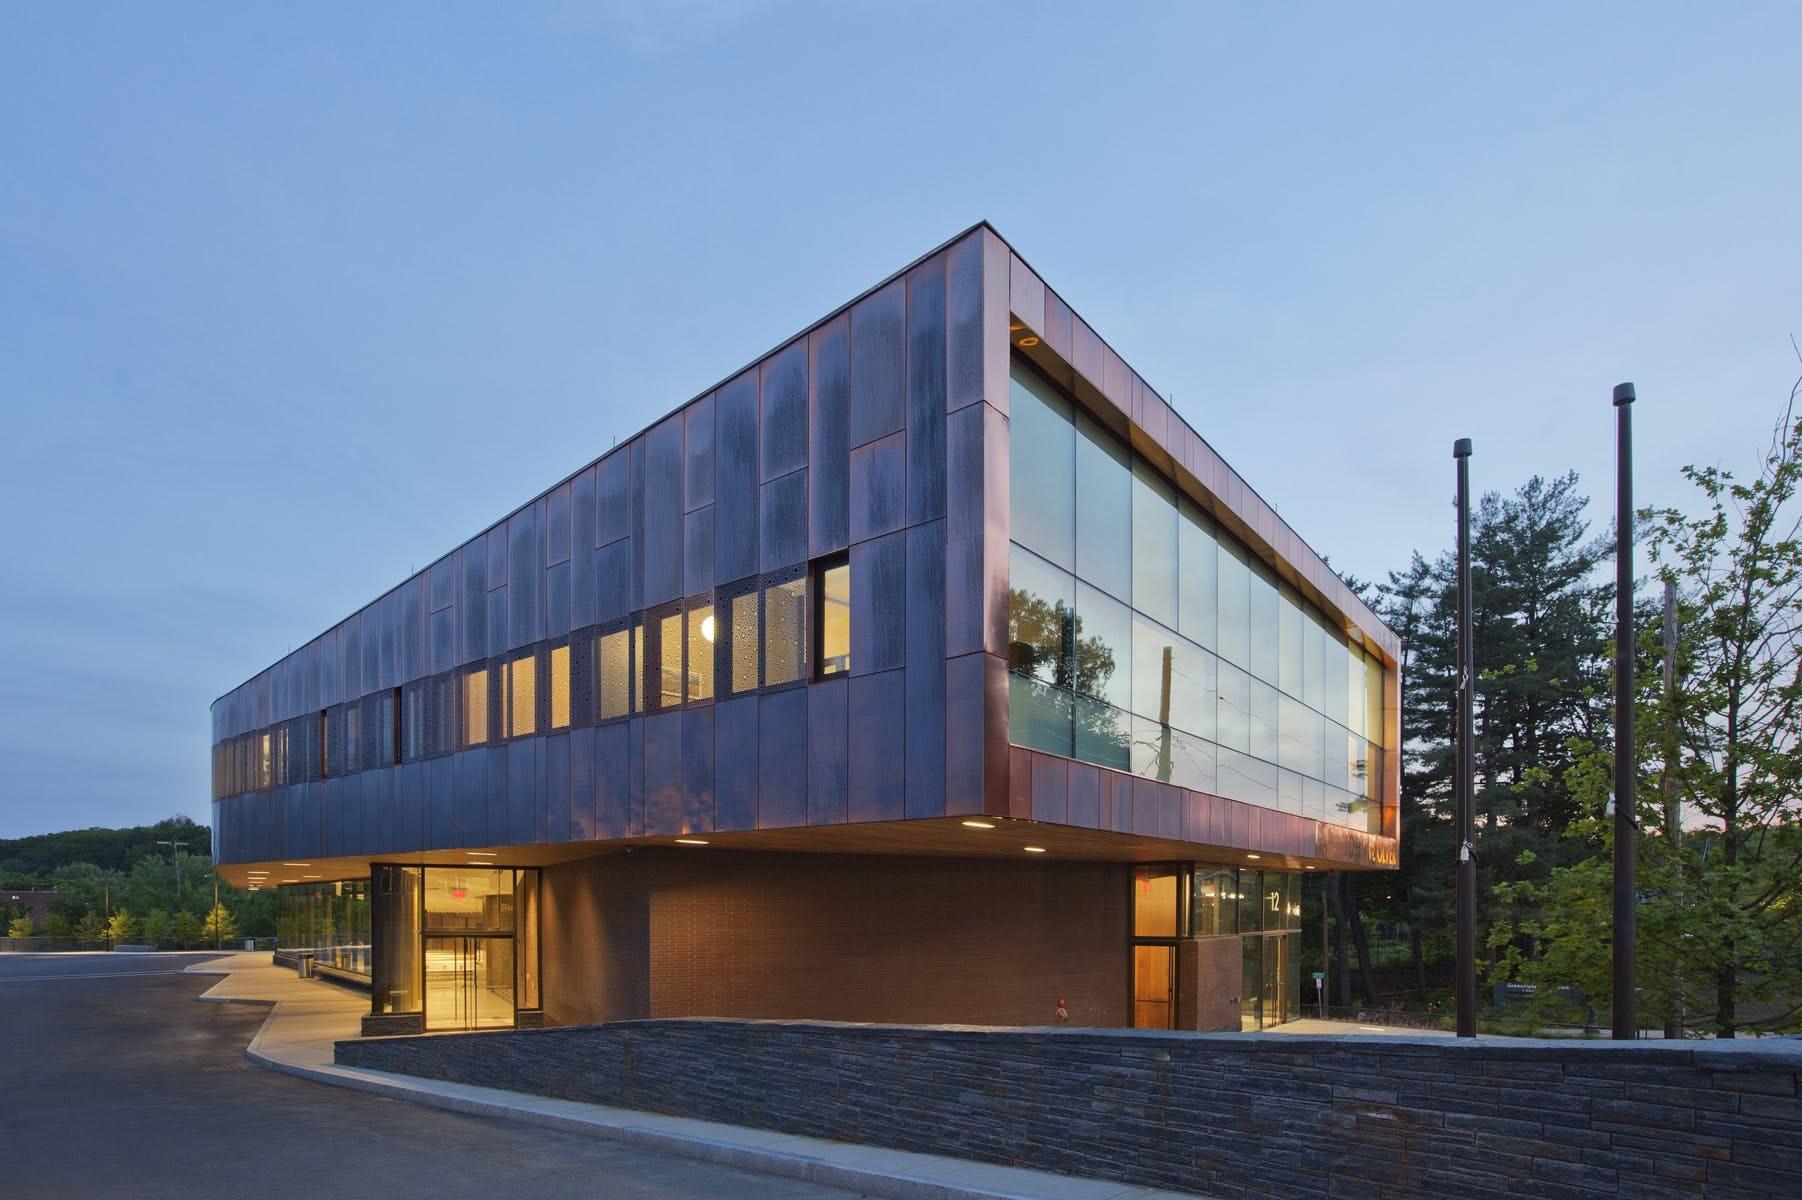 Superb John W. Olver Transit Center, Zero Net Energy Building, By Charles Rose  Architects